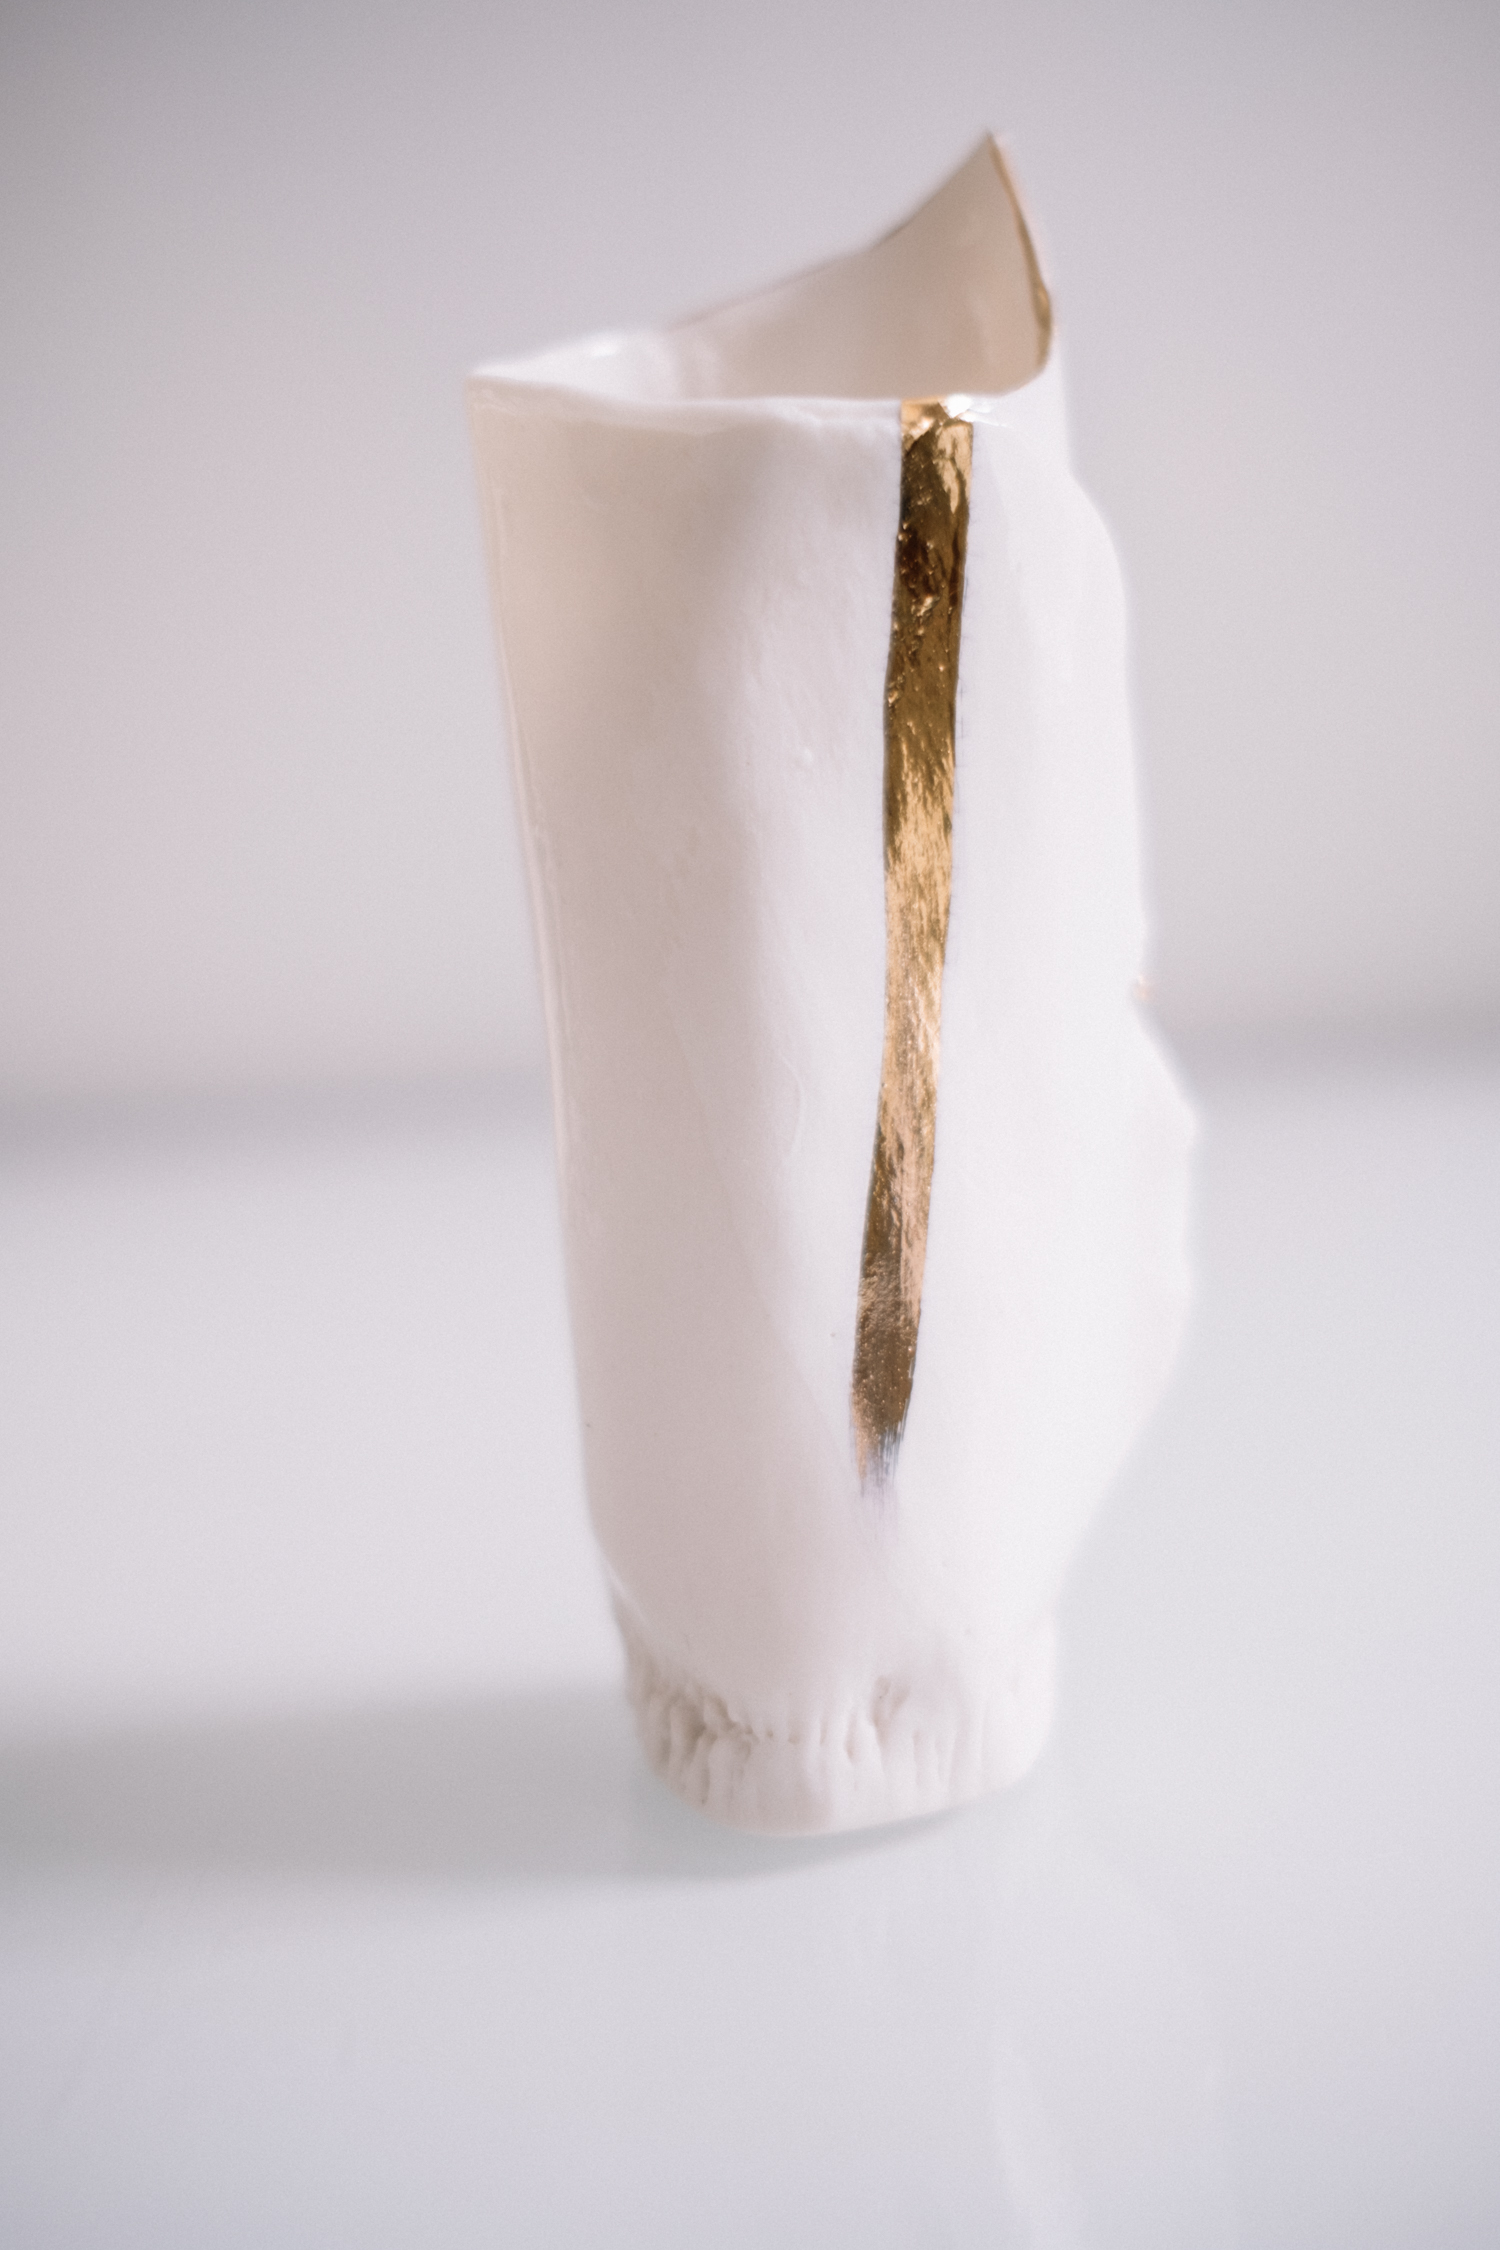 white vase 1 3.jpg